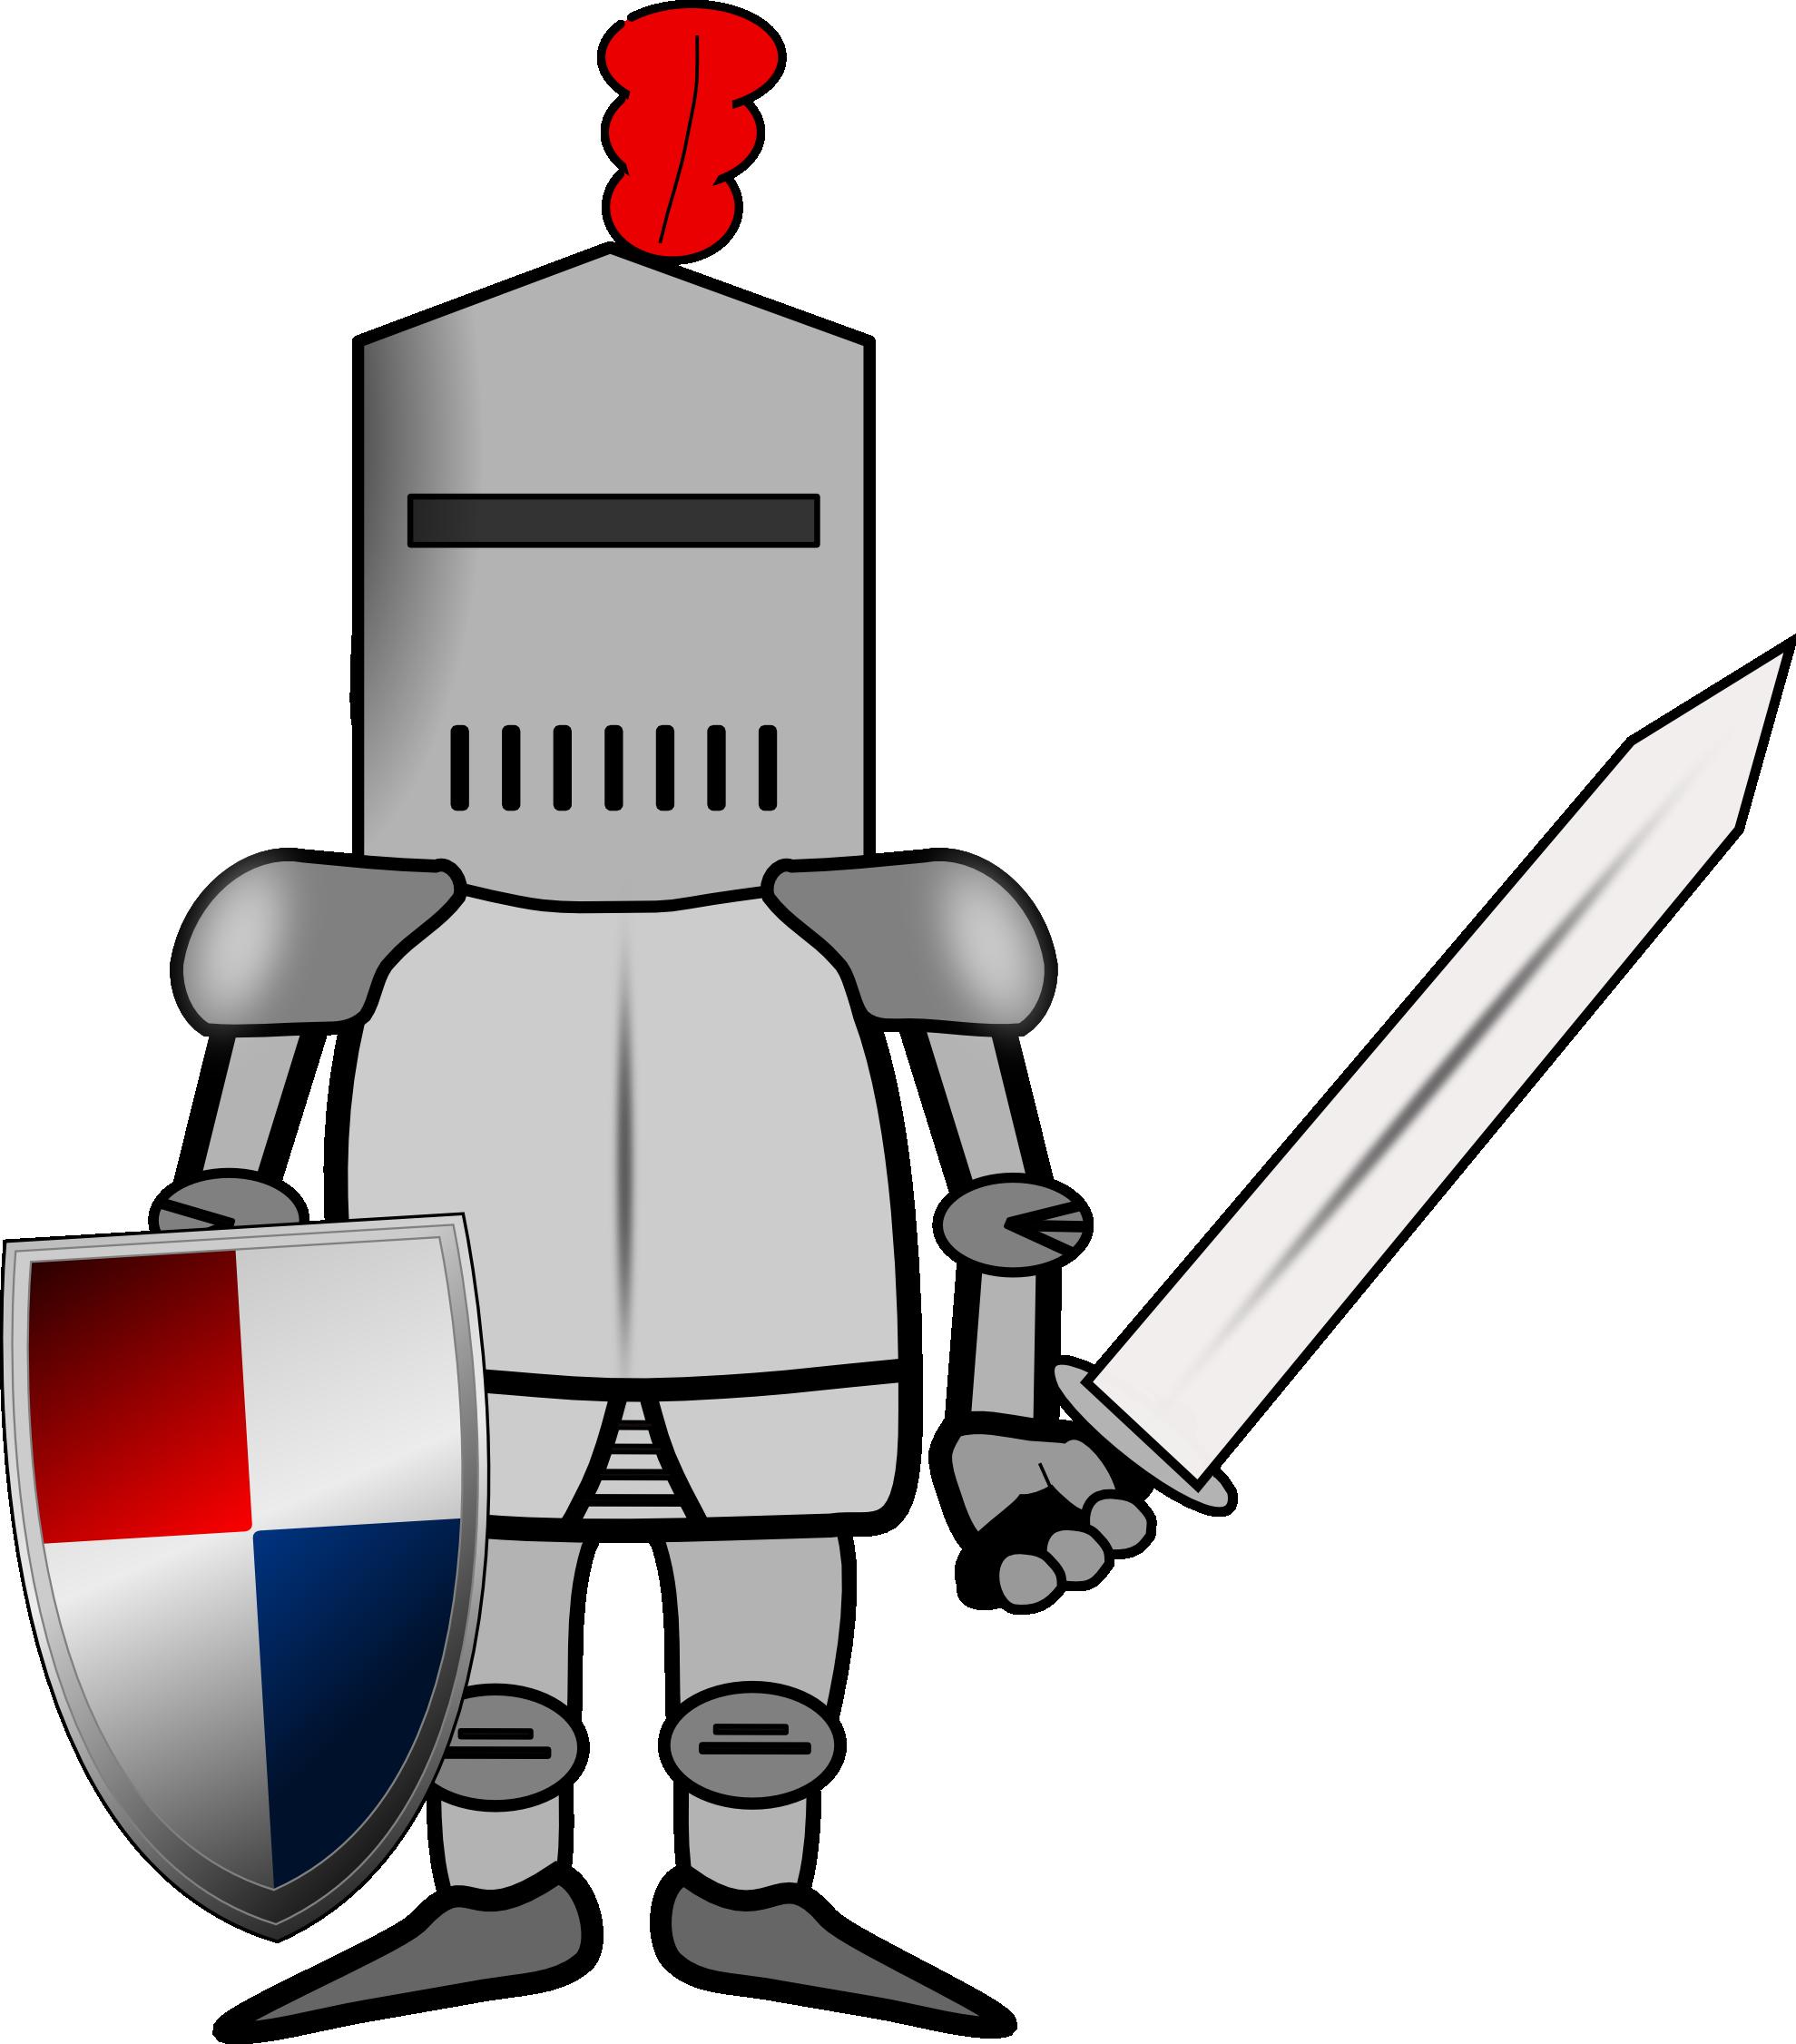 Knight cartoon clipart svg royalty free stock Free Knight Cliparts, Download Free Clip Art, Free Clip Art ... svg royalty free stock